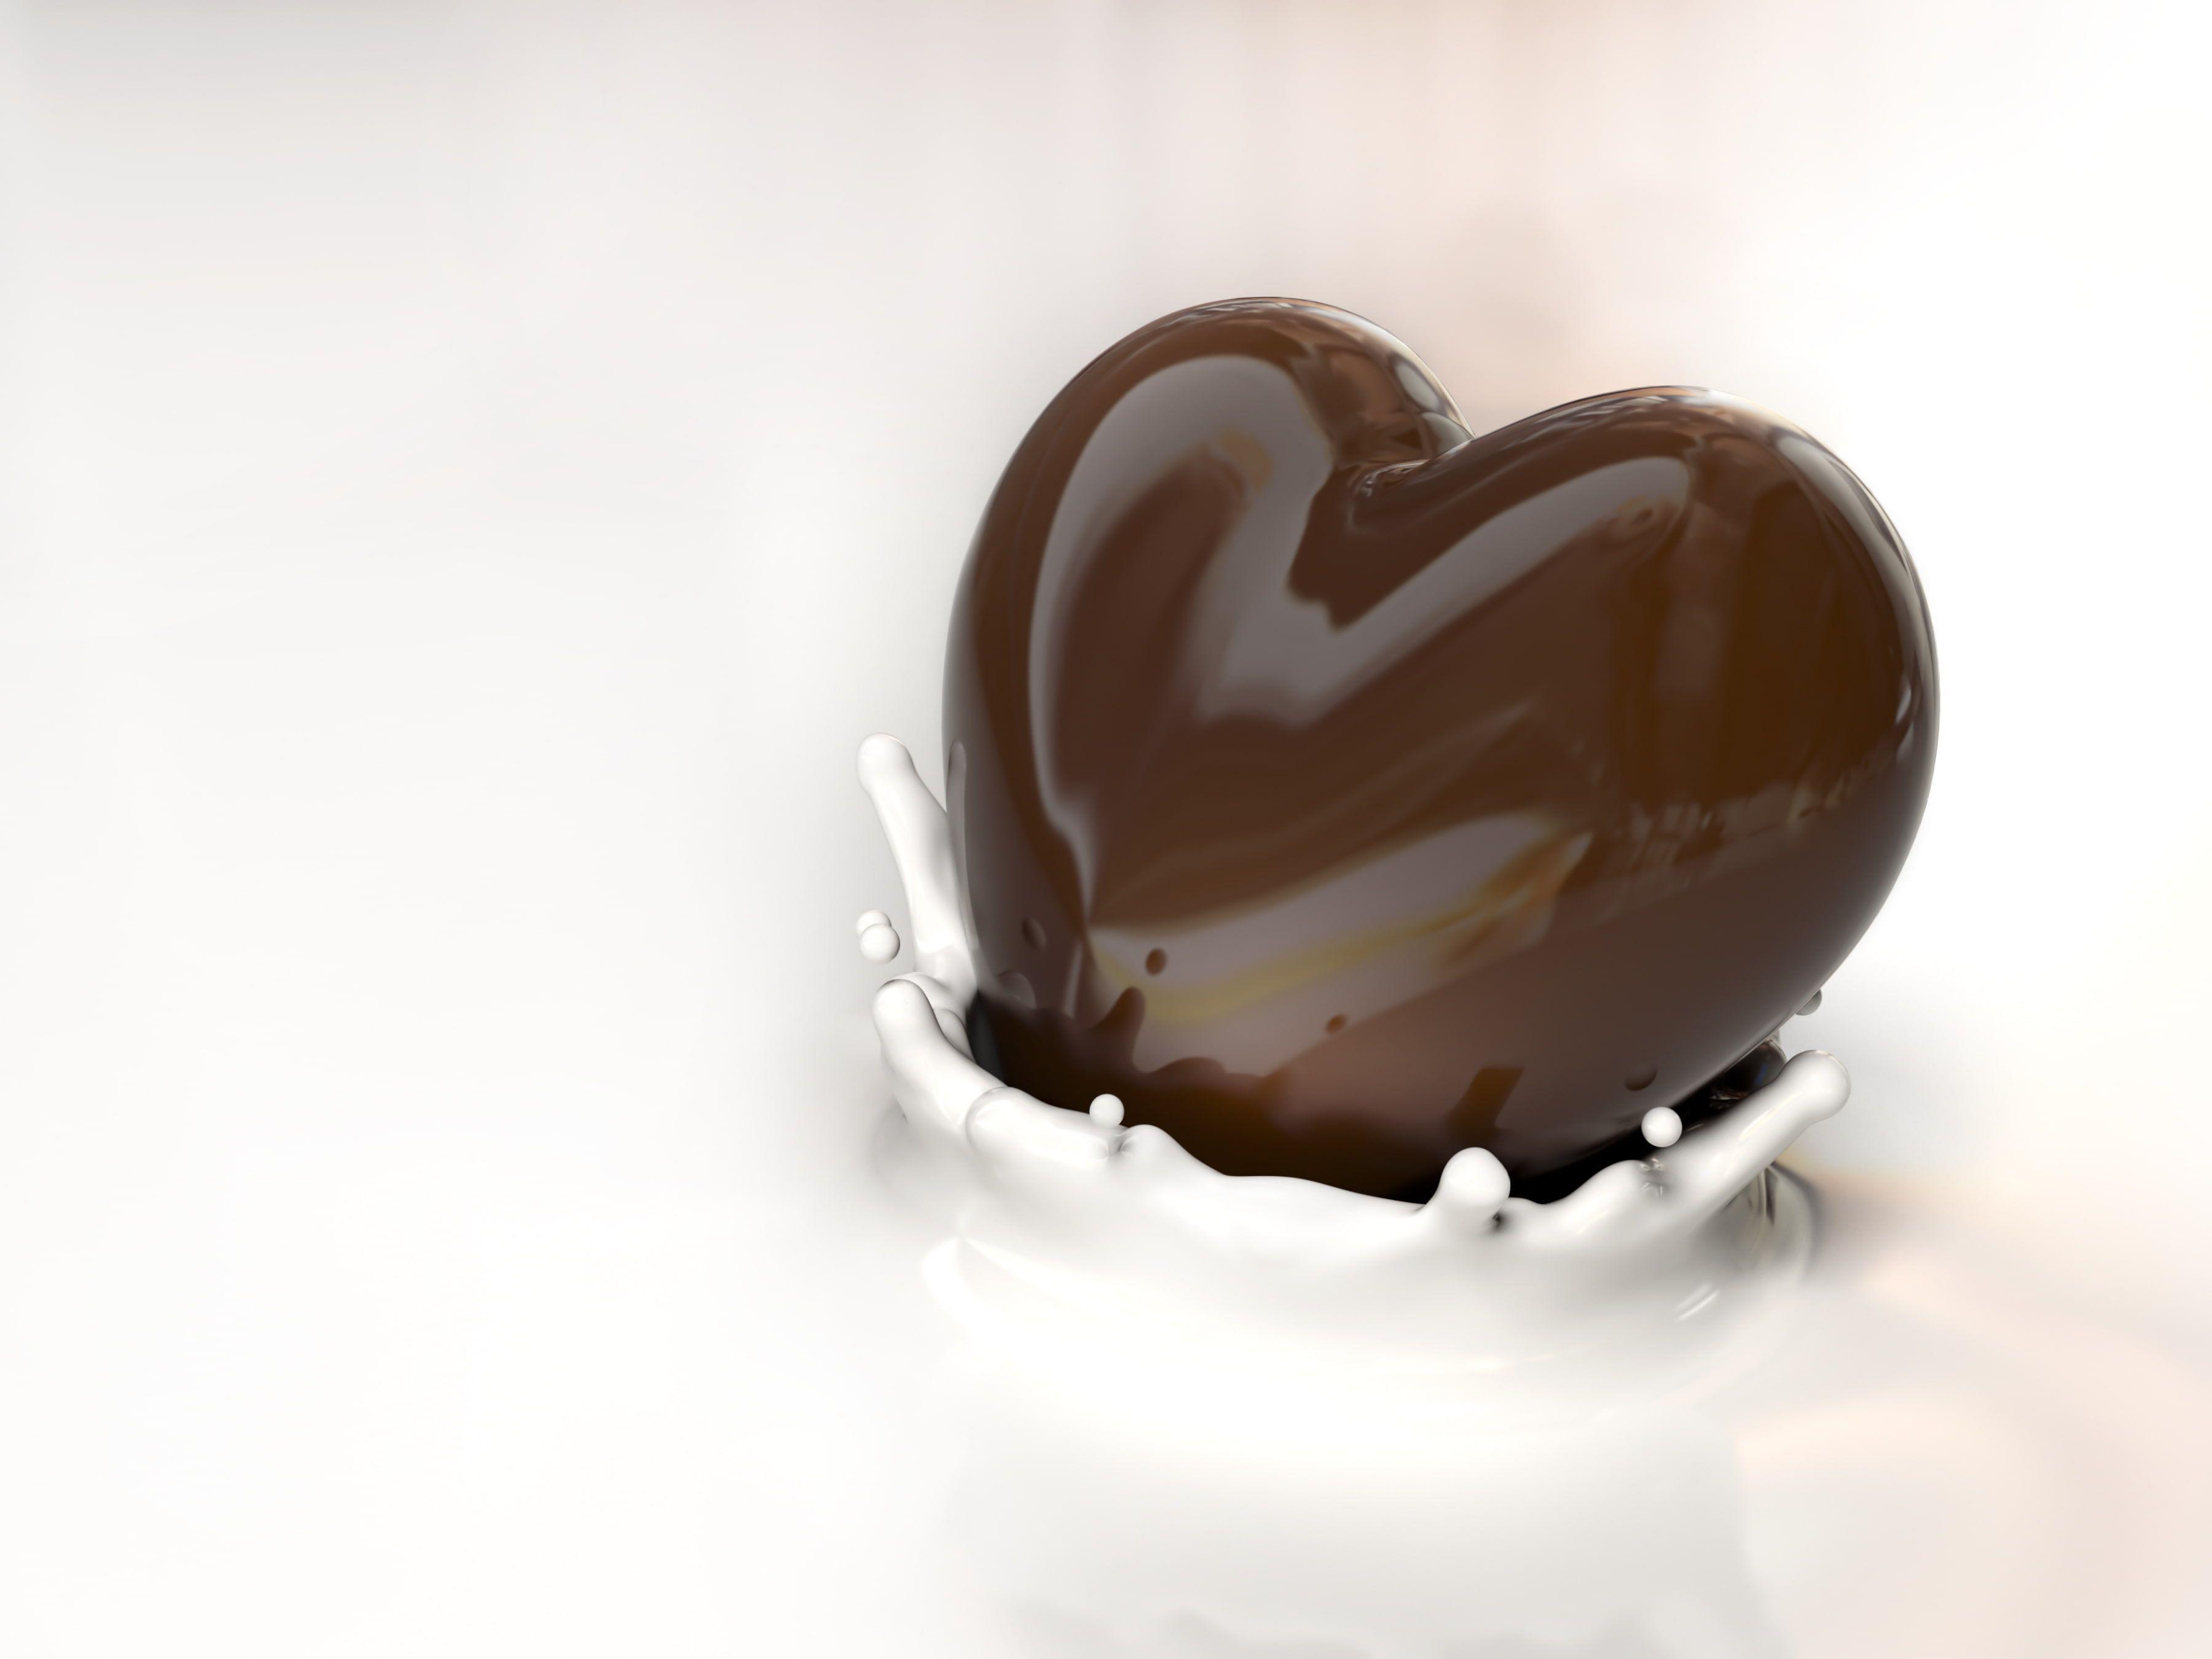 Pin By The Gabro On Sezione Aurea Chocolate Wallpaper Heart Chocolate Chocolate Milk